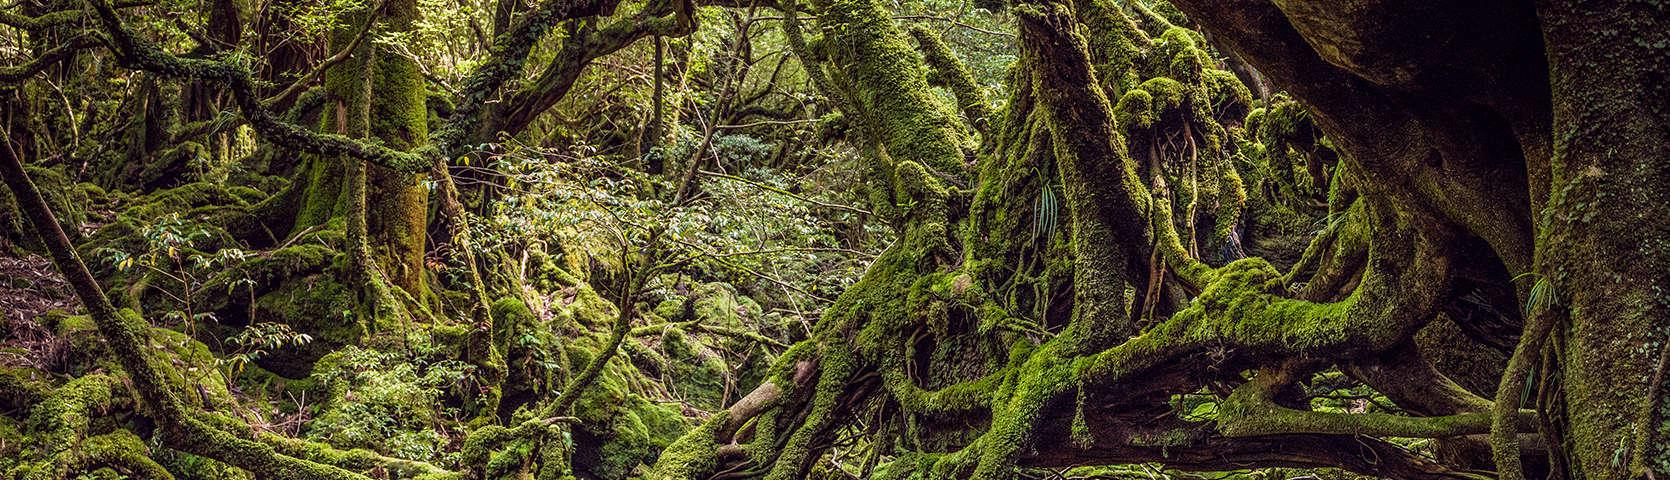 cedar forests